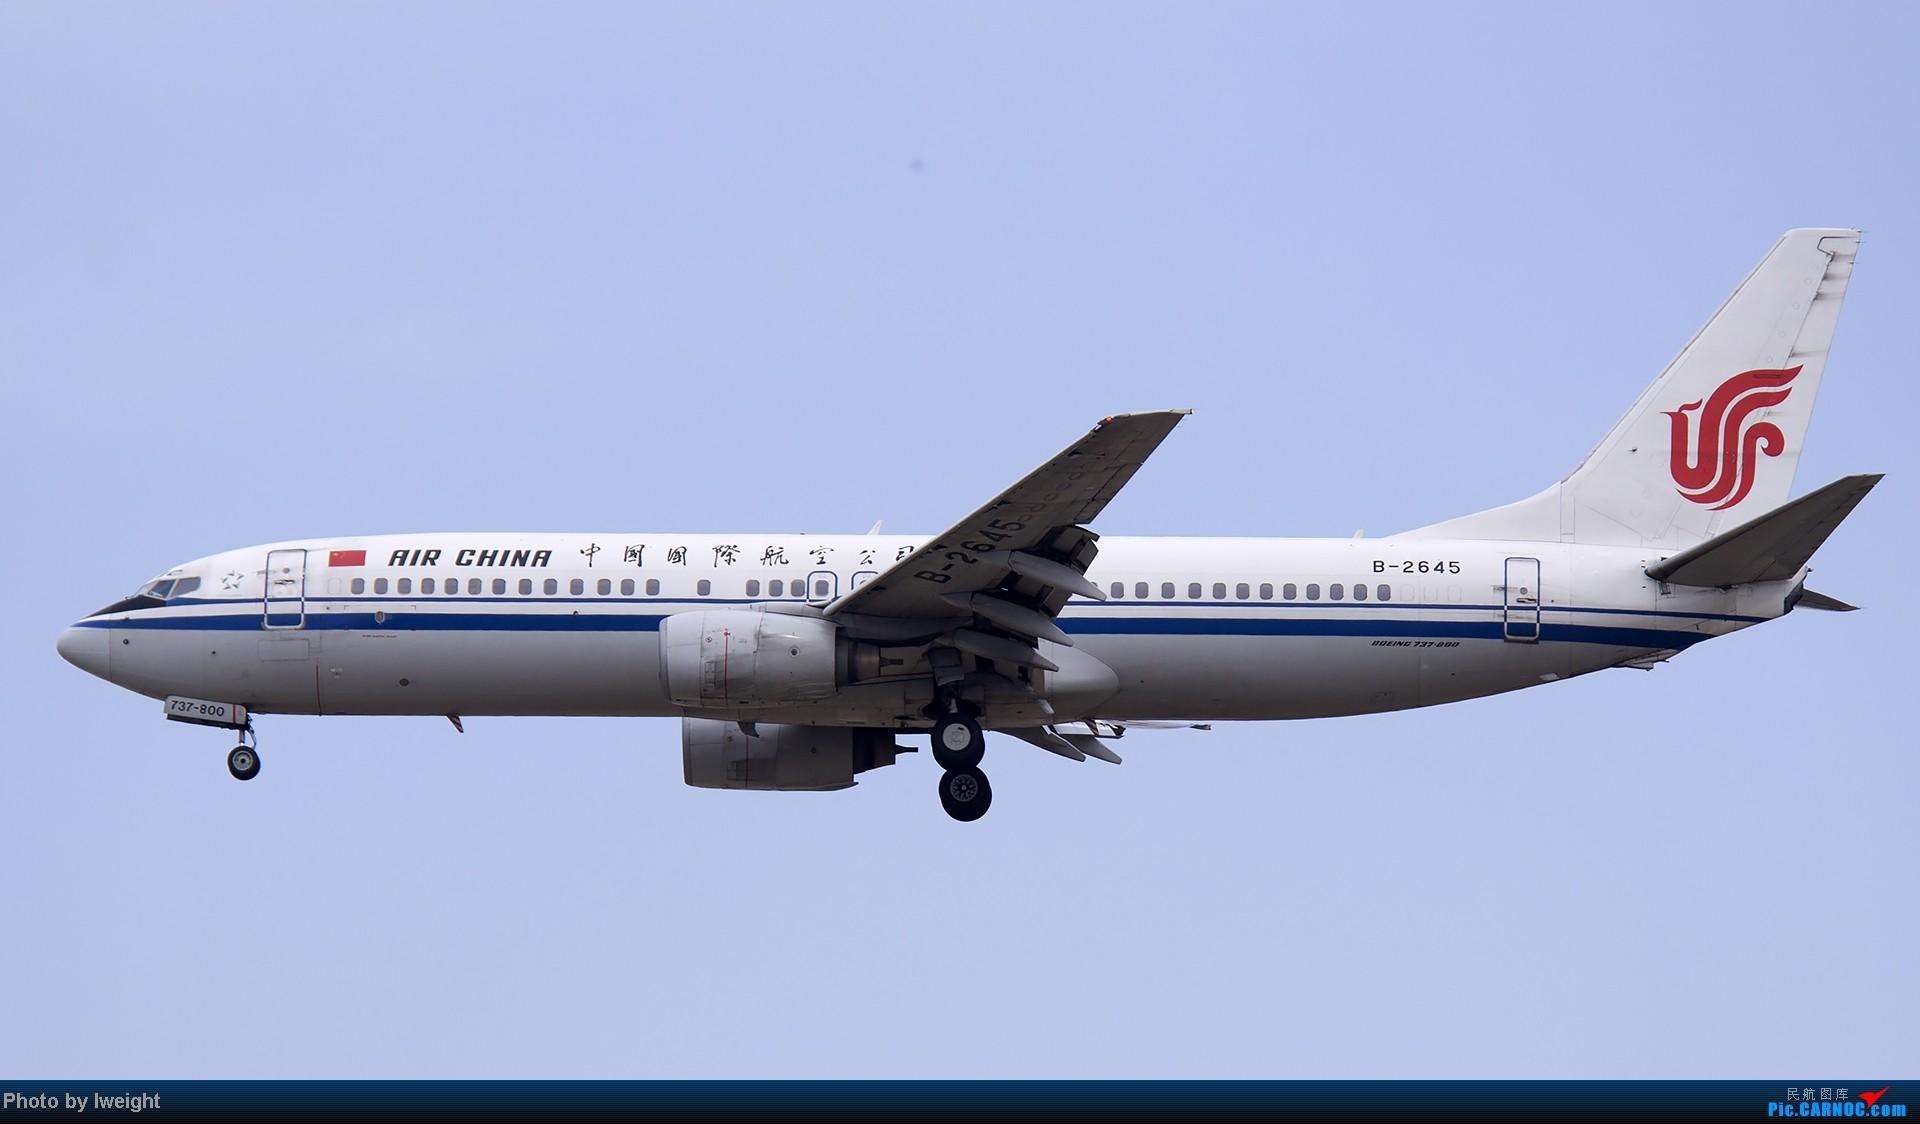 Re:[原创]北京难得的好天气,收获多种机型和彩绘,遗憾的是再次错过卡航巴塞罗那彩绘 BOEING 737-800 B-2645 中国北京首都机场